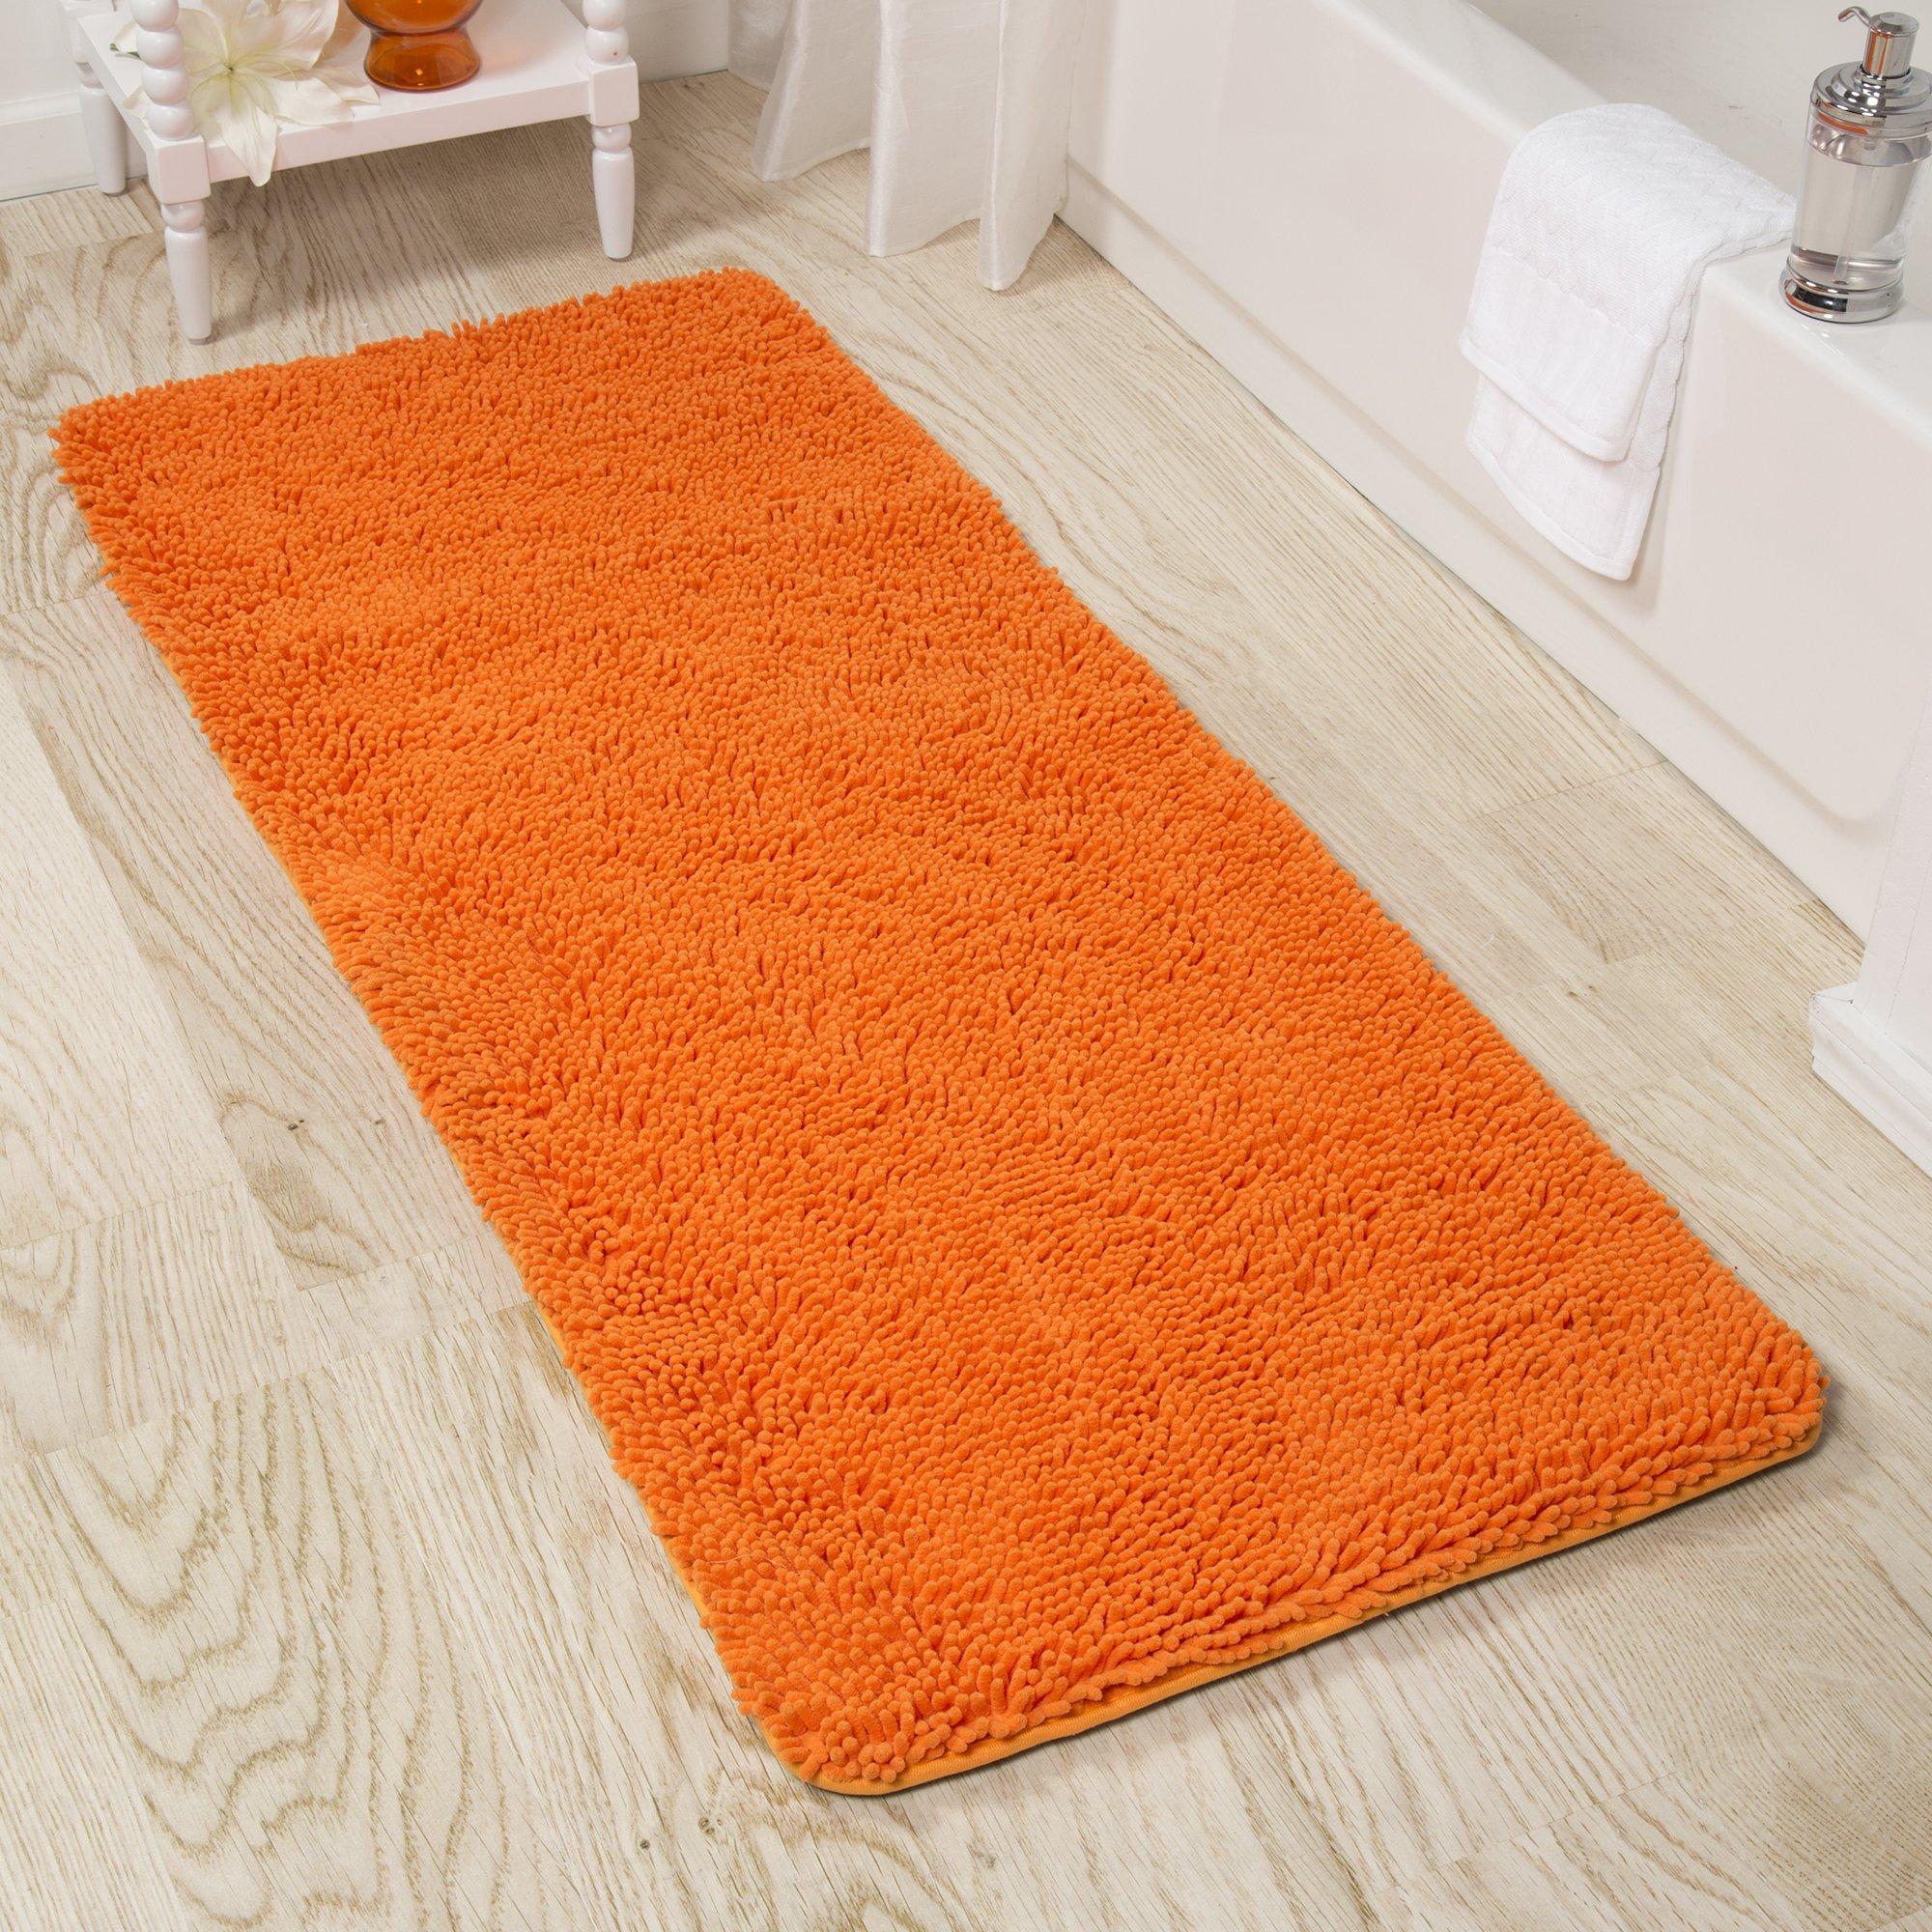 Lavish Home Memory Foam Shag Bath Mat 2-Feet by 5-Feet - Orange